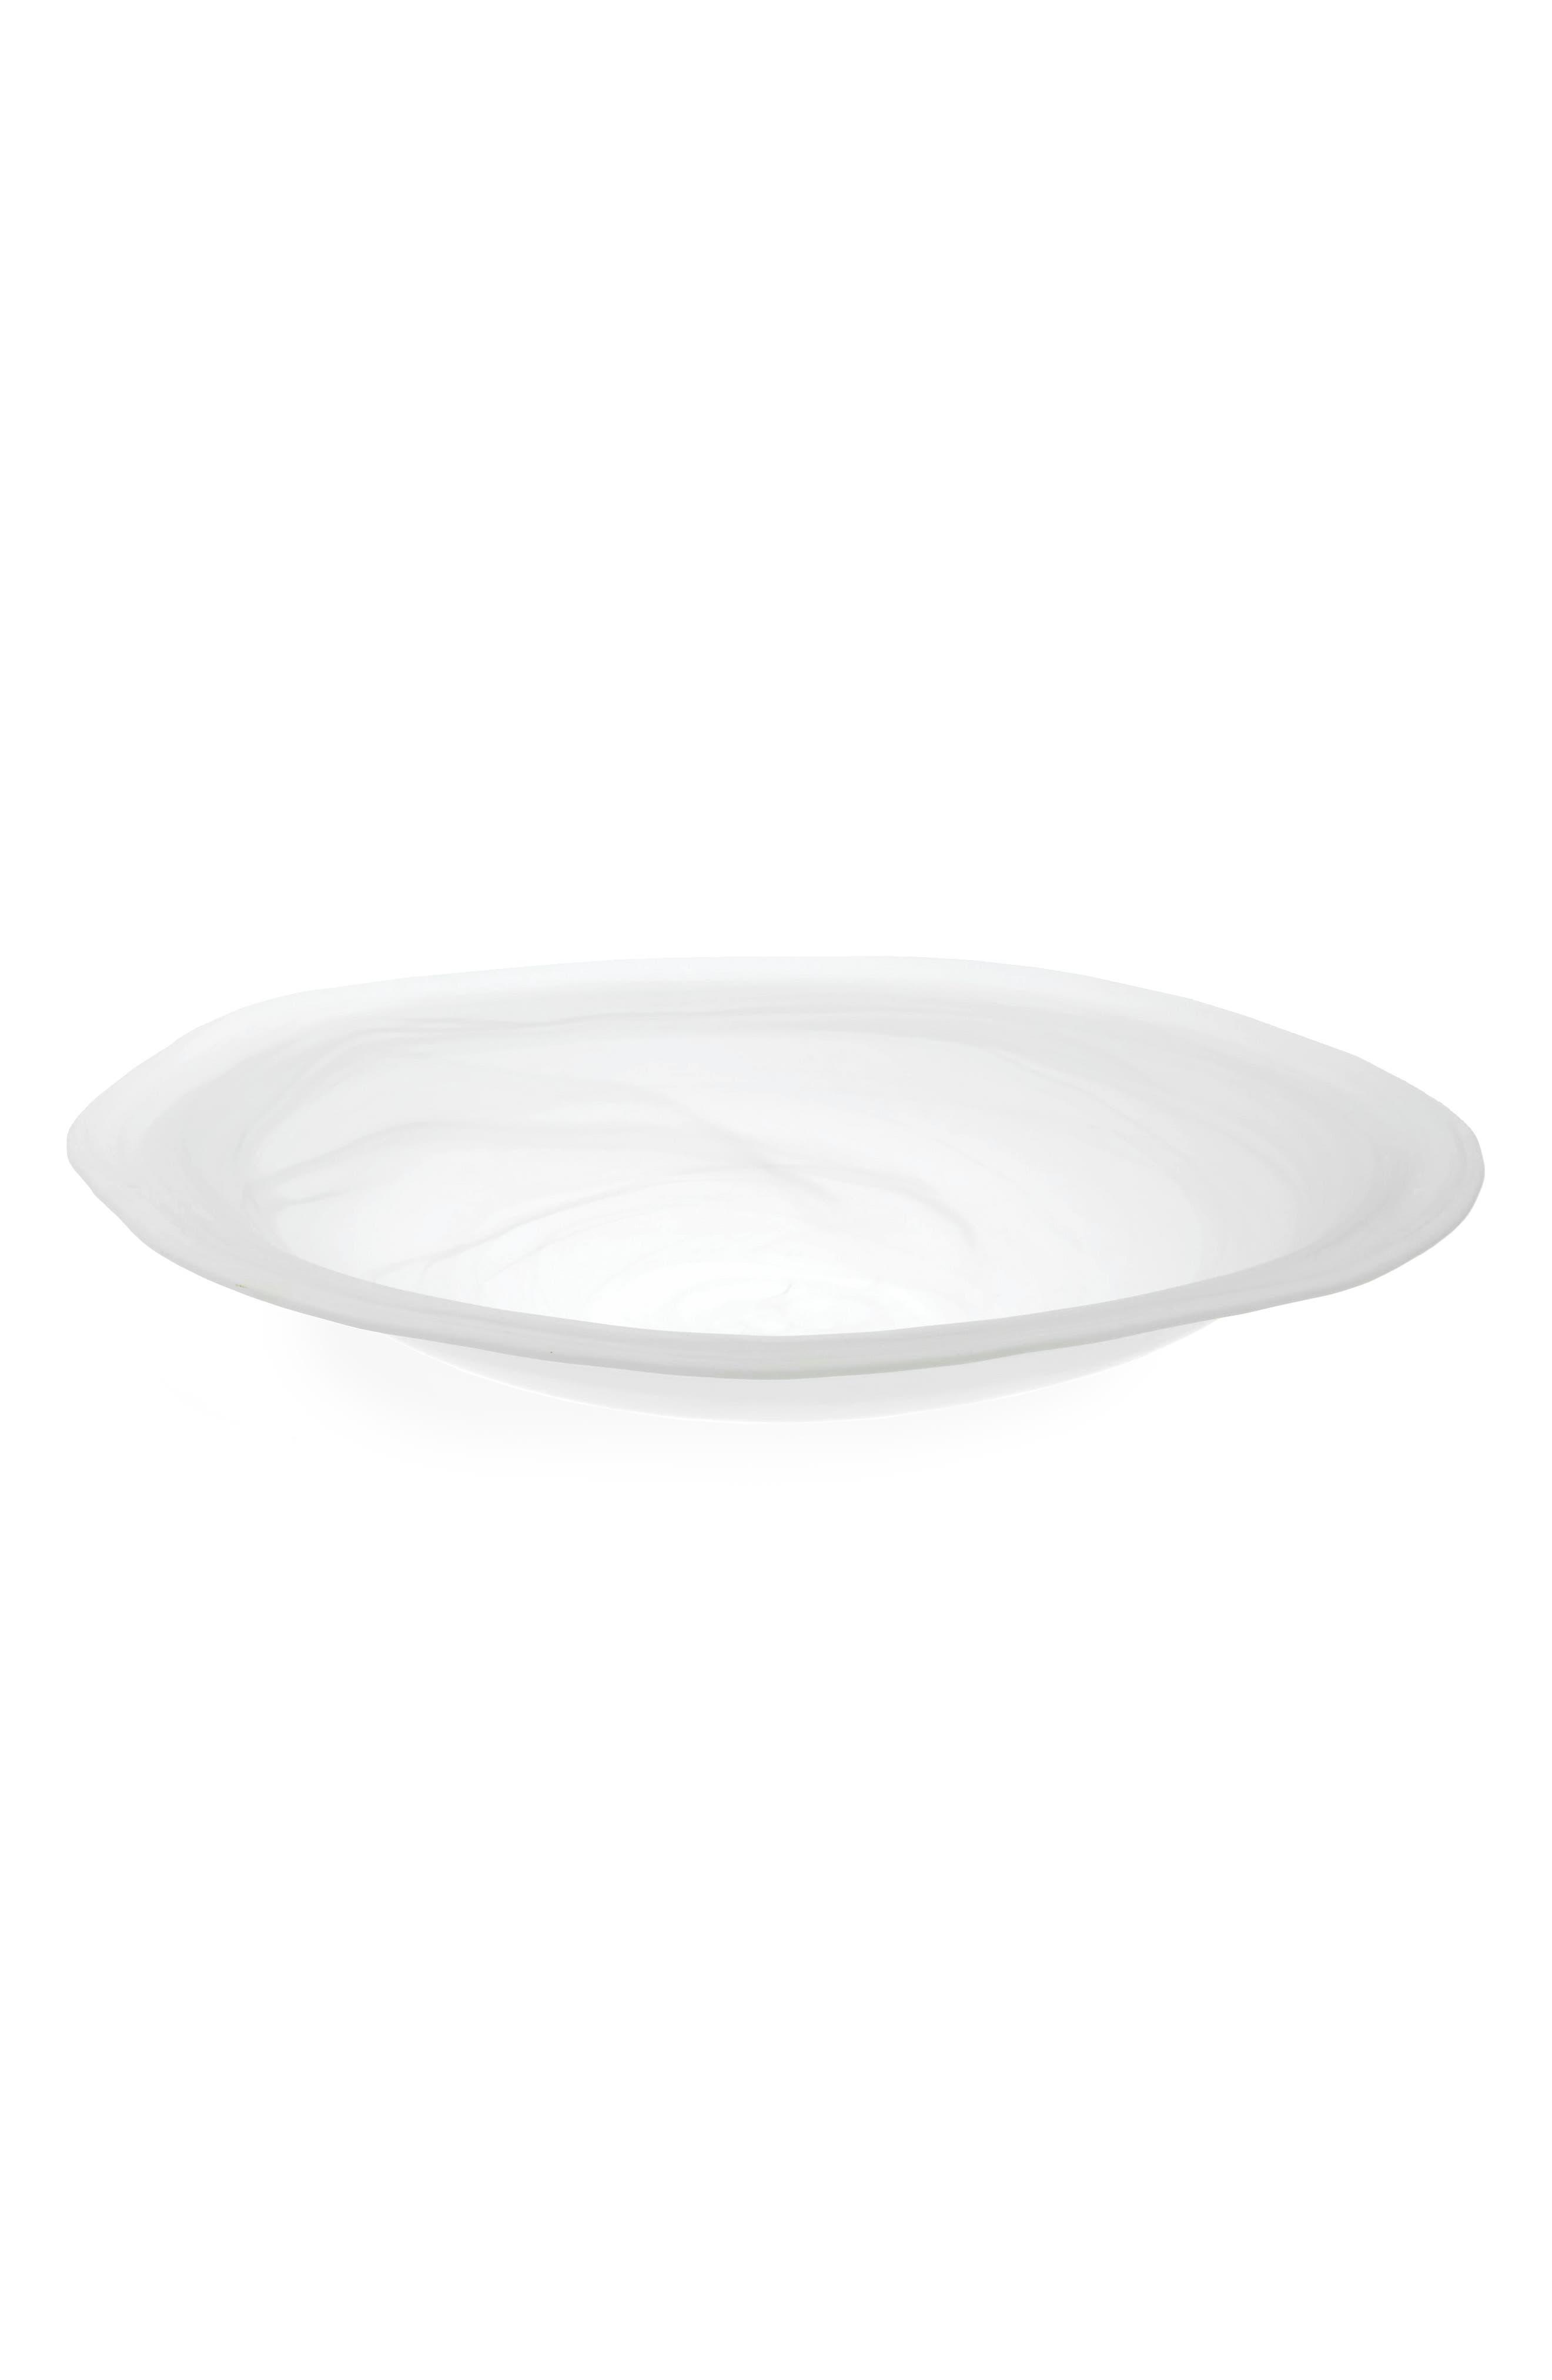 Frosted Alabaster Glass Platter,                         Main,                         color, 100